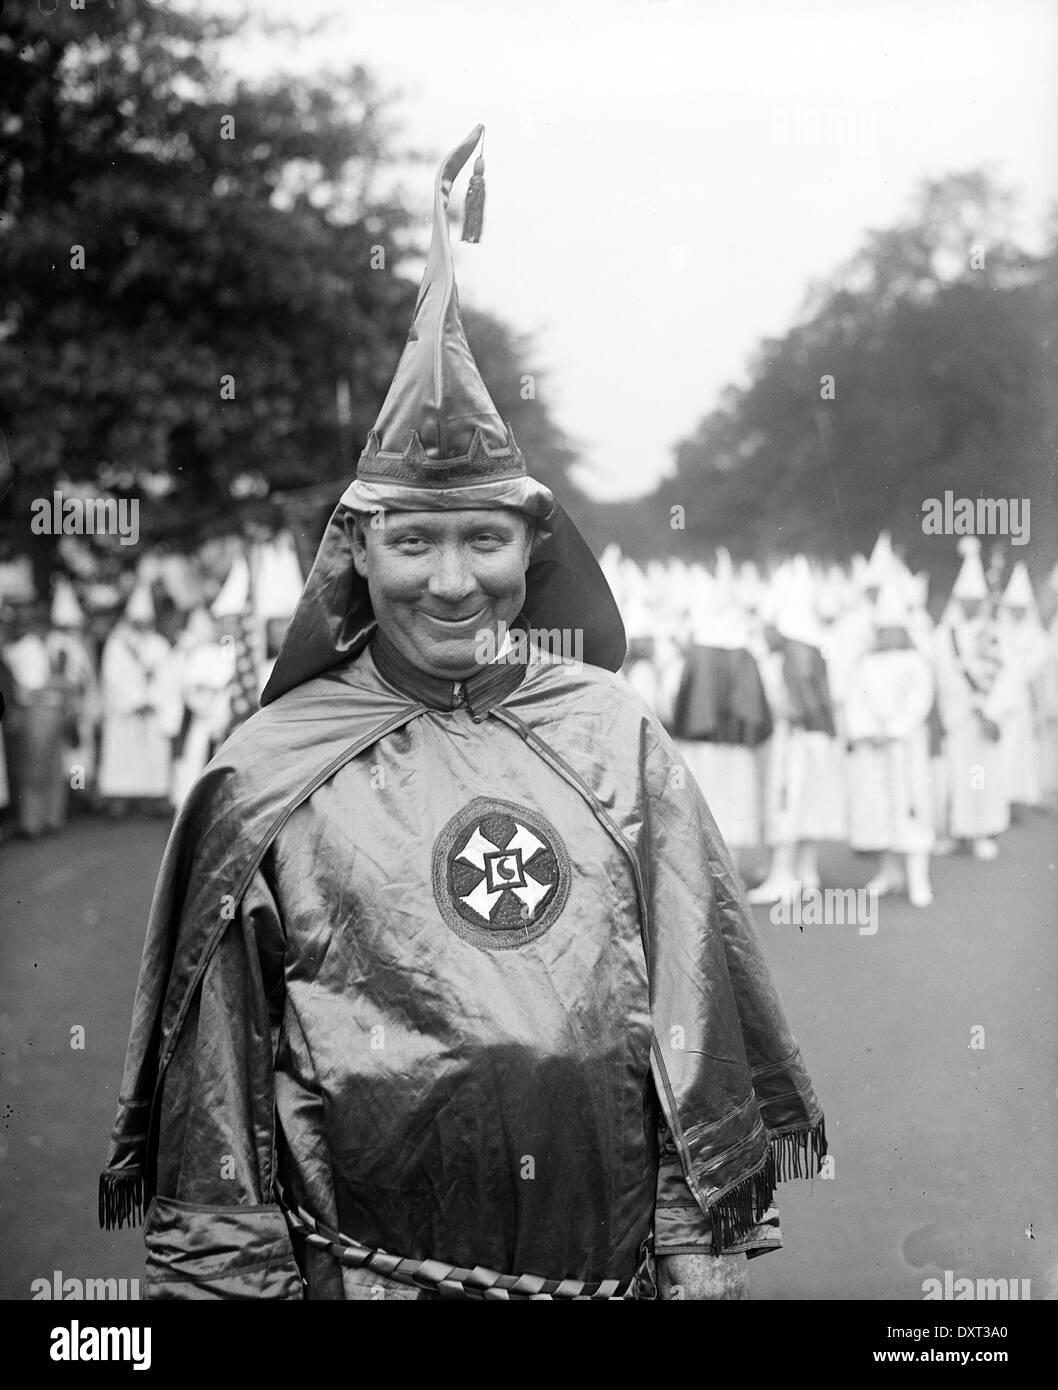 Ku Klux Klan member, United States of America - Stock Image